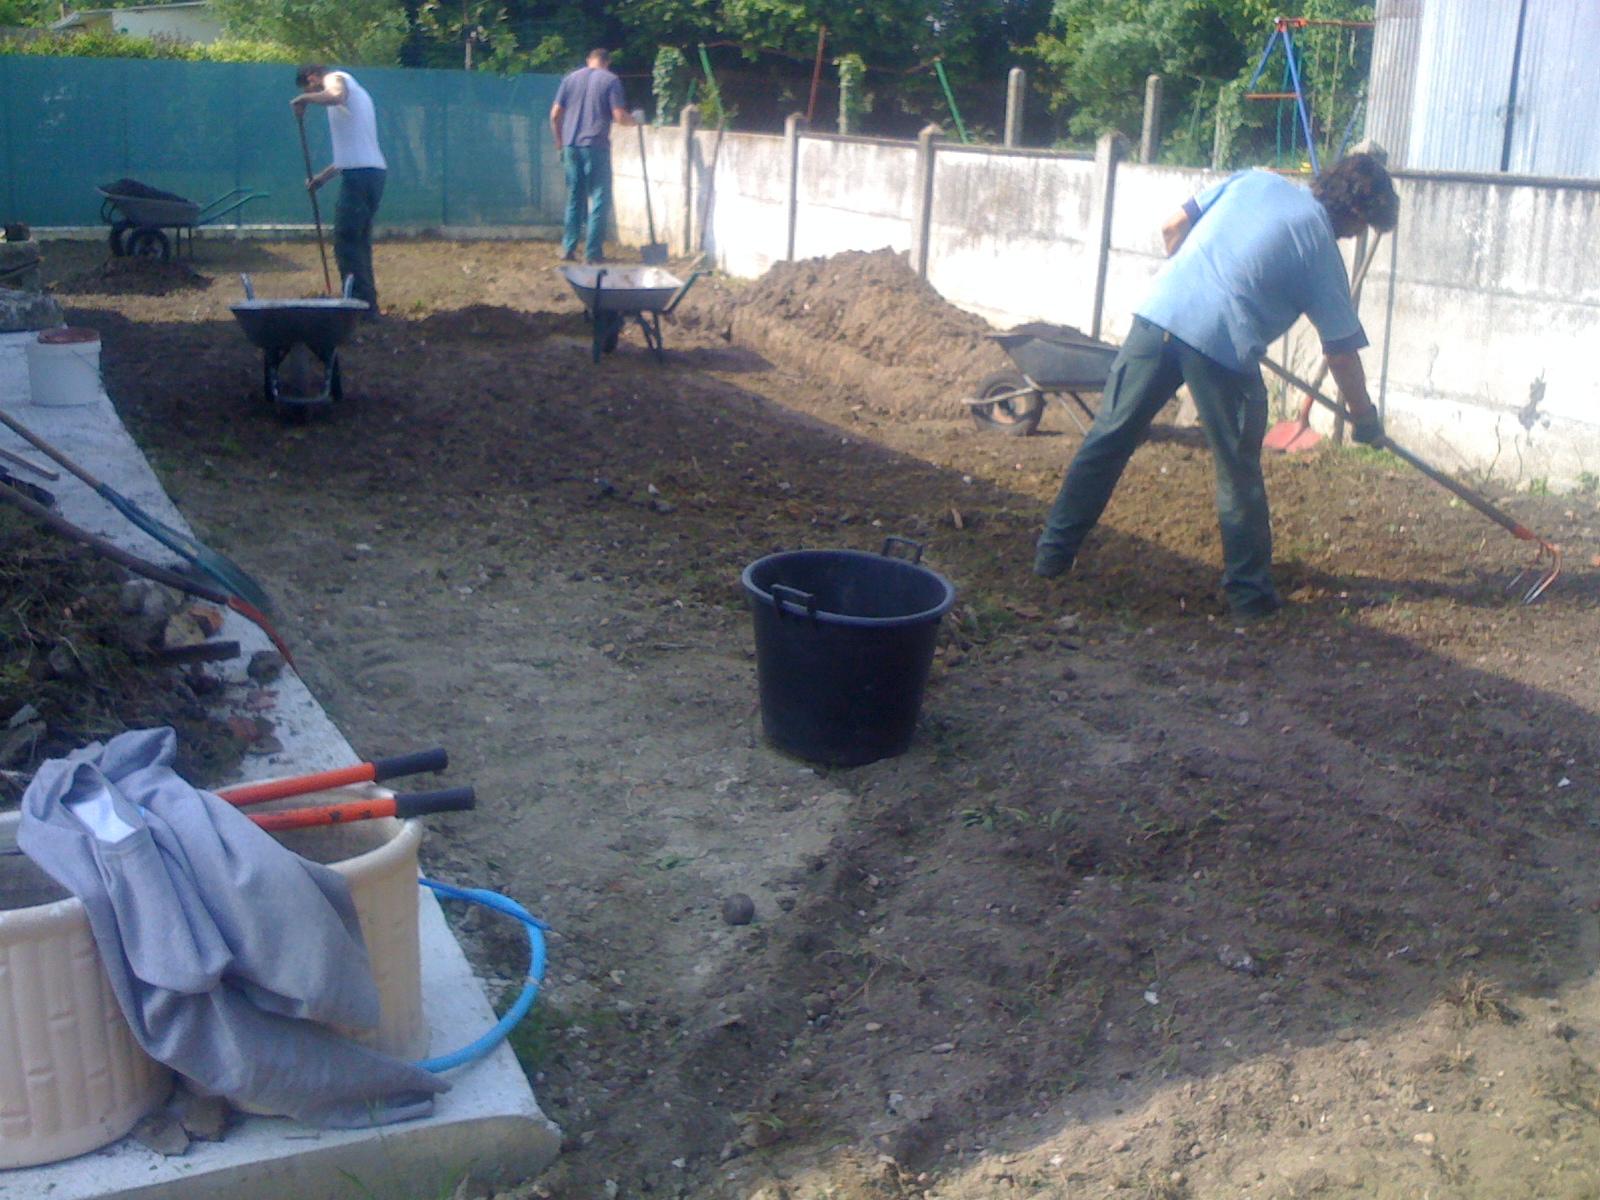 Nettoyage Jardin Bastide | Paysagiste Bordeaux serapportantà Entretien Jardin Bordeaux